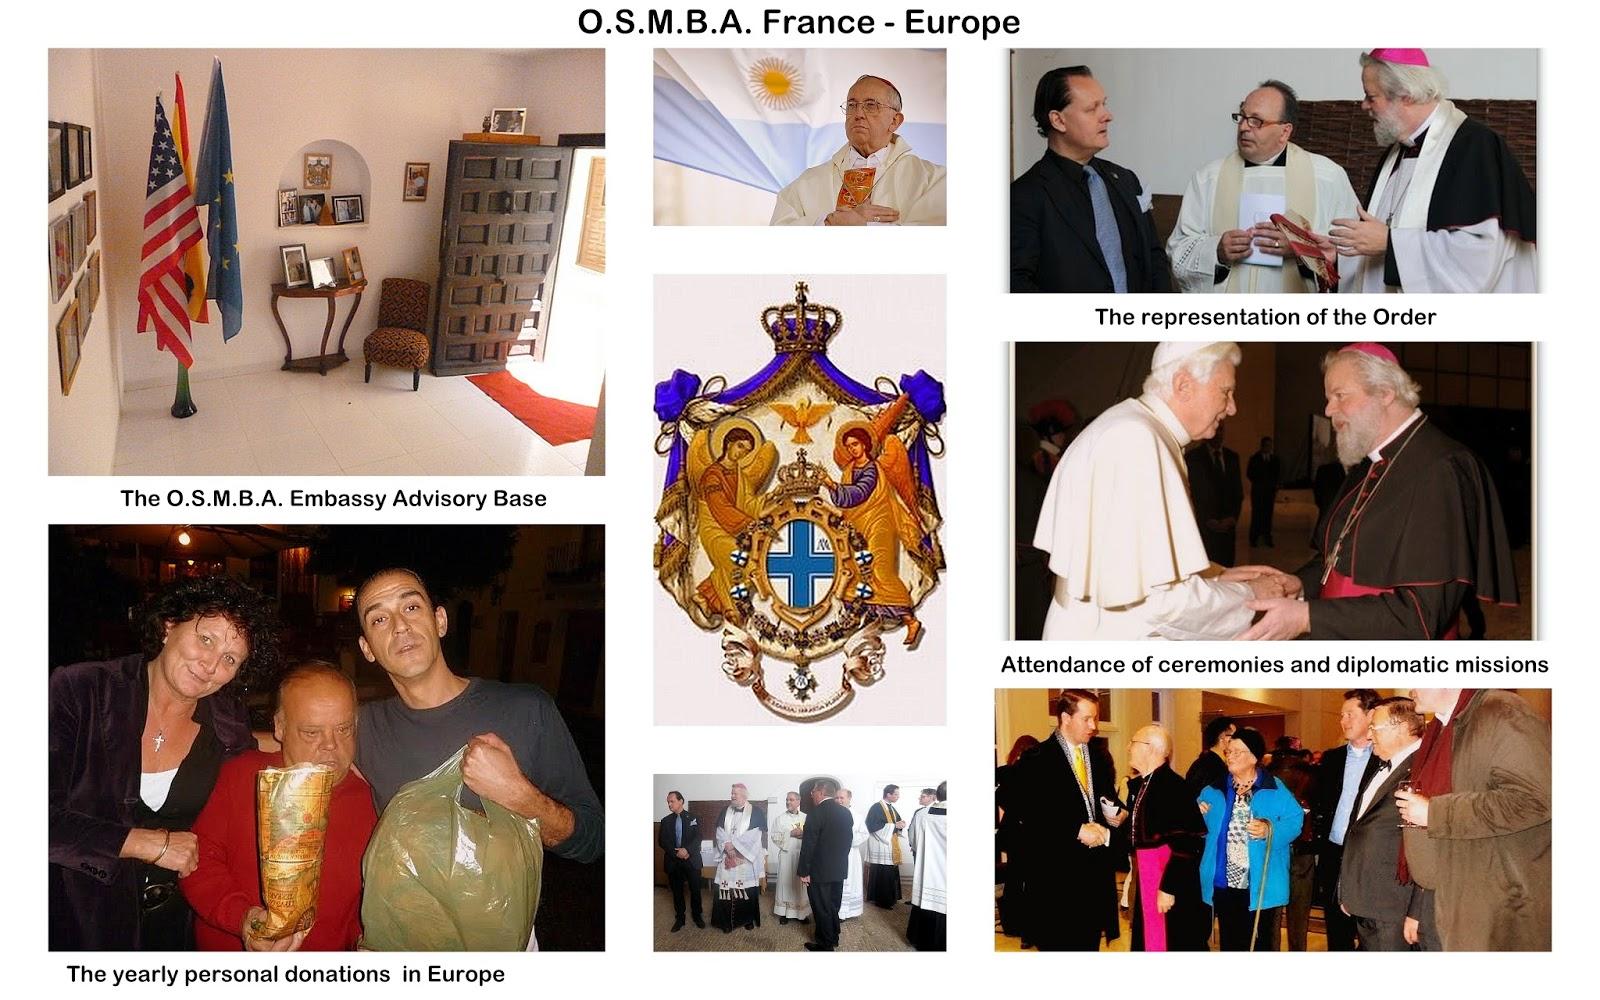 O.S.M.B.A. France